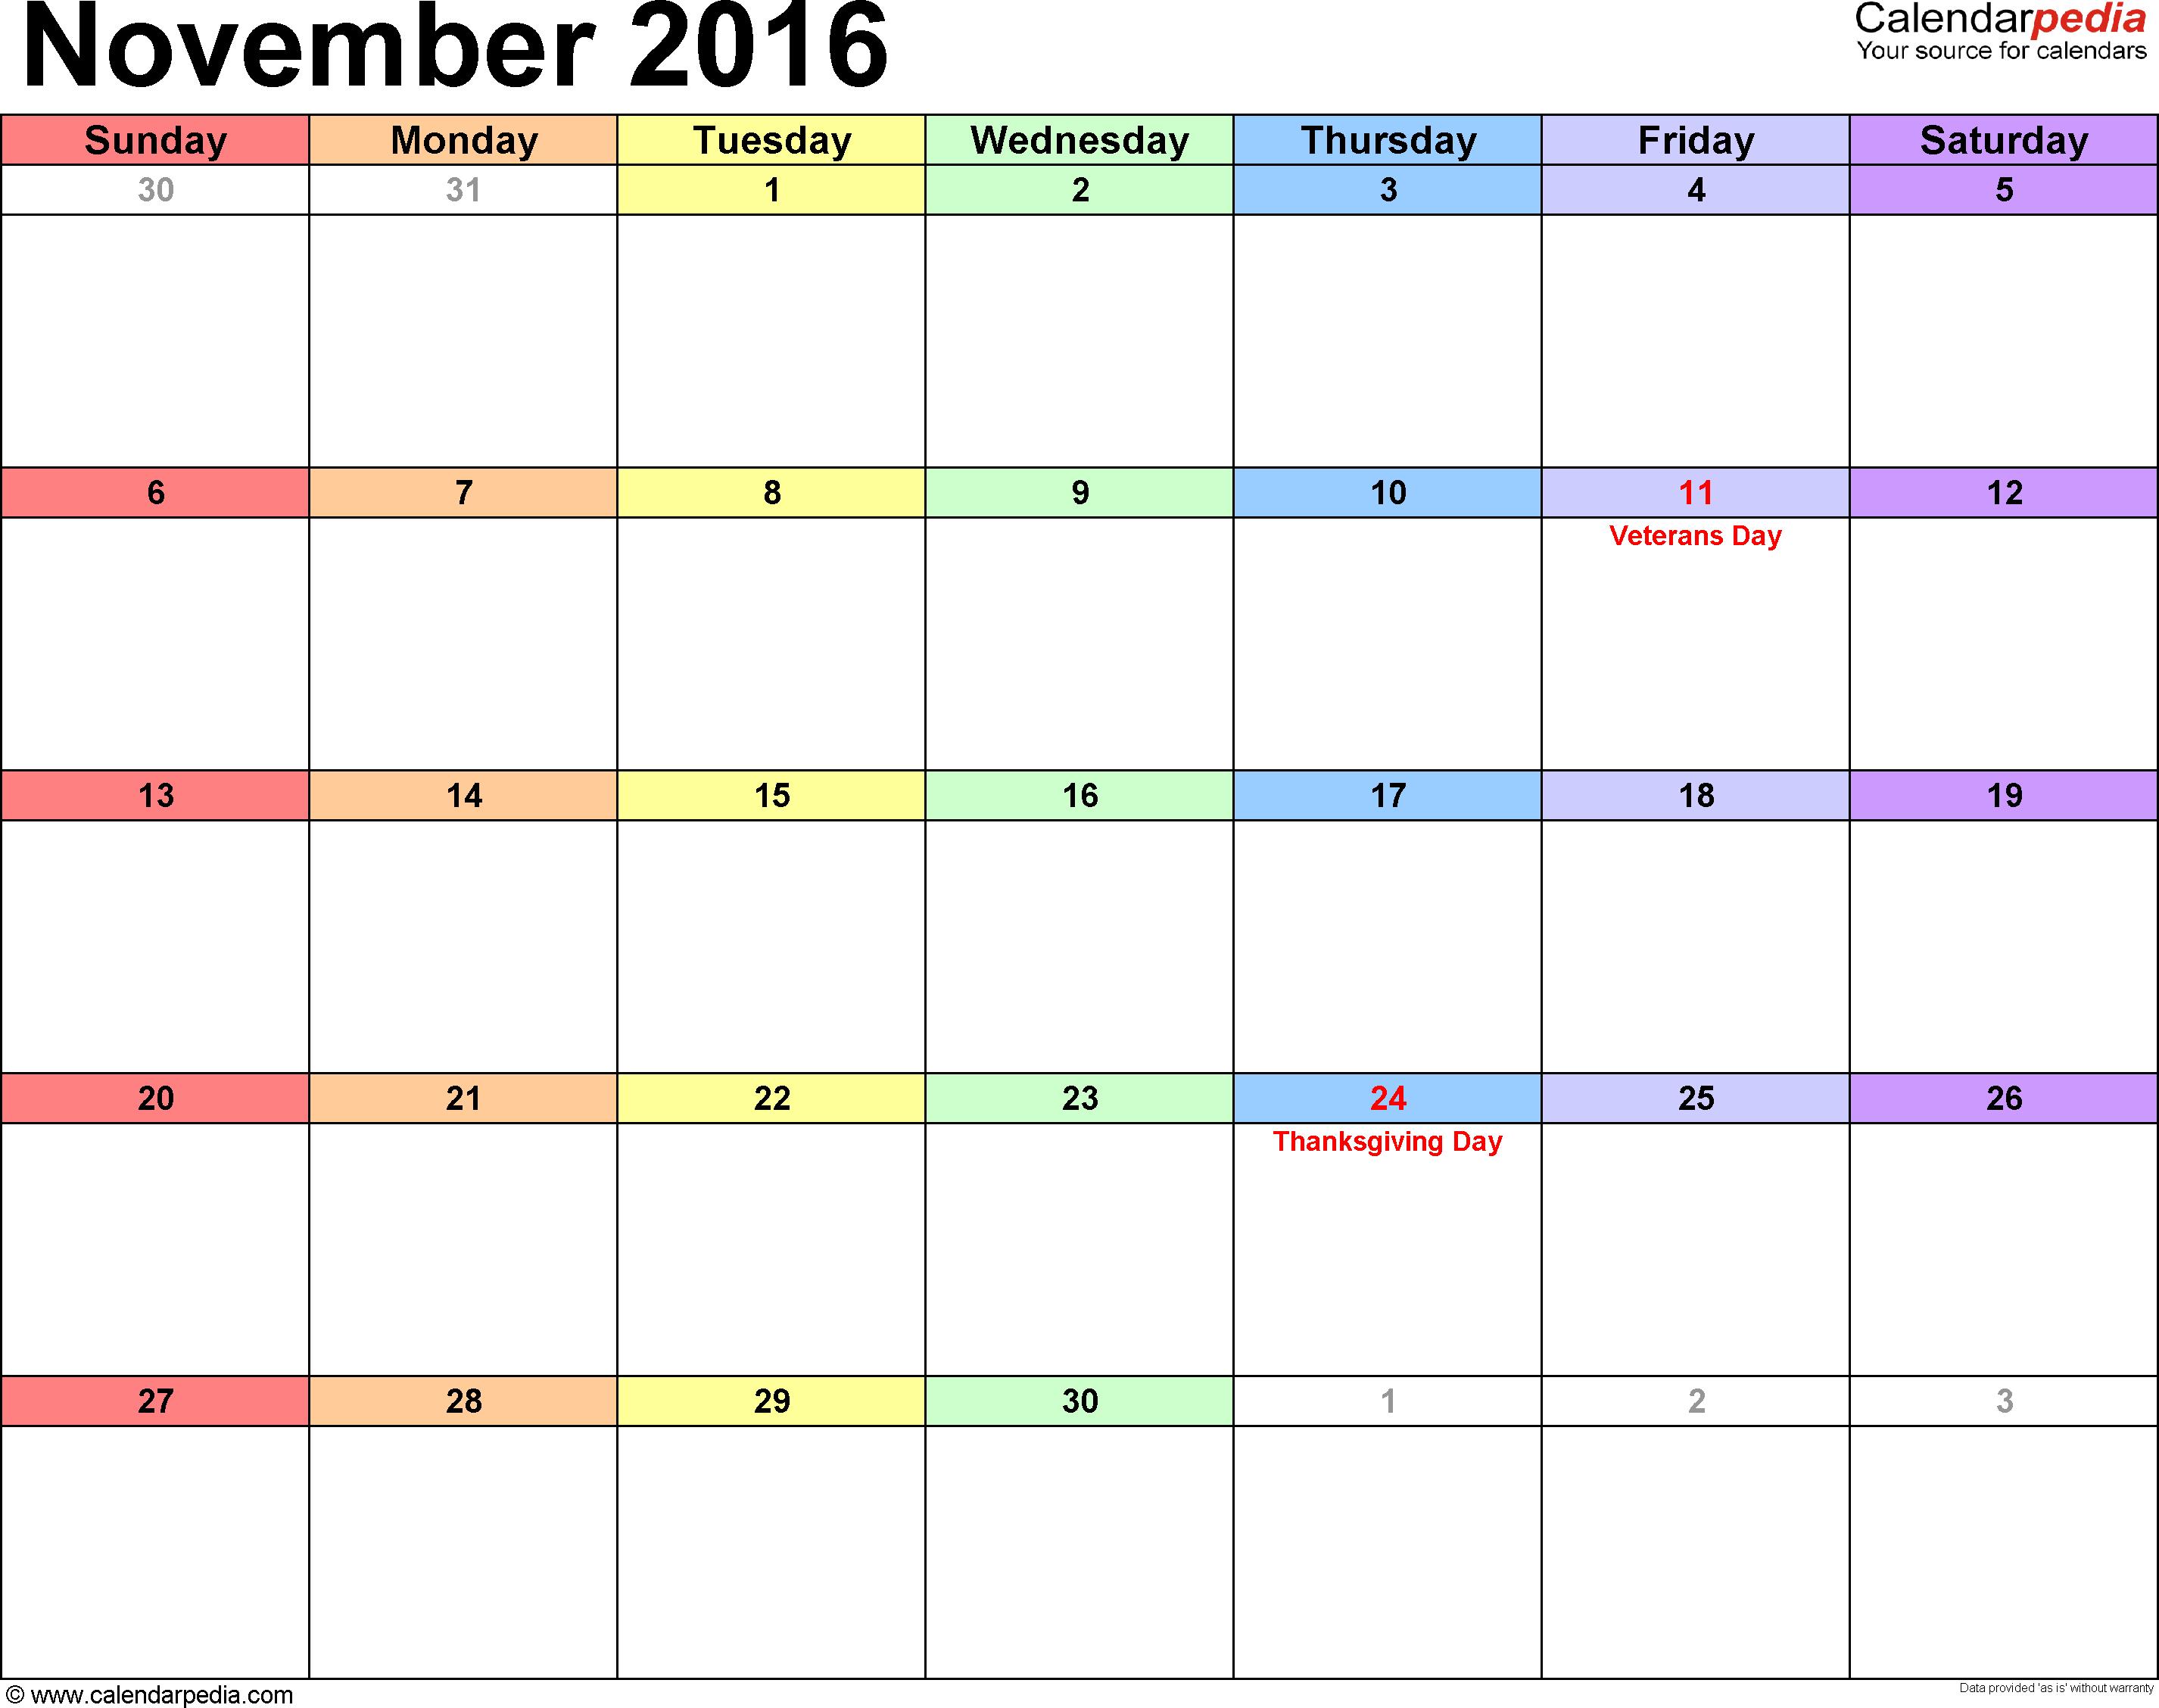 Monthly calendar november 2016 clipart clip art royalty free stock November 2016 Calendars for Word, Excel & PDF clip art royalty free stock